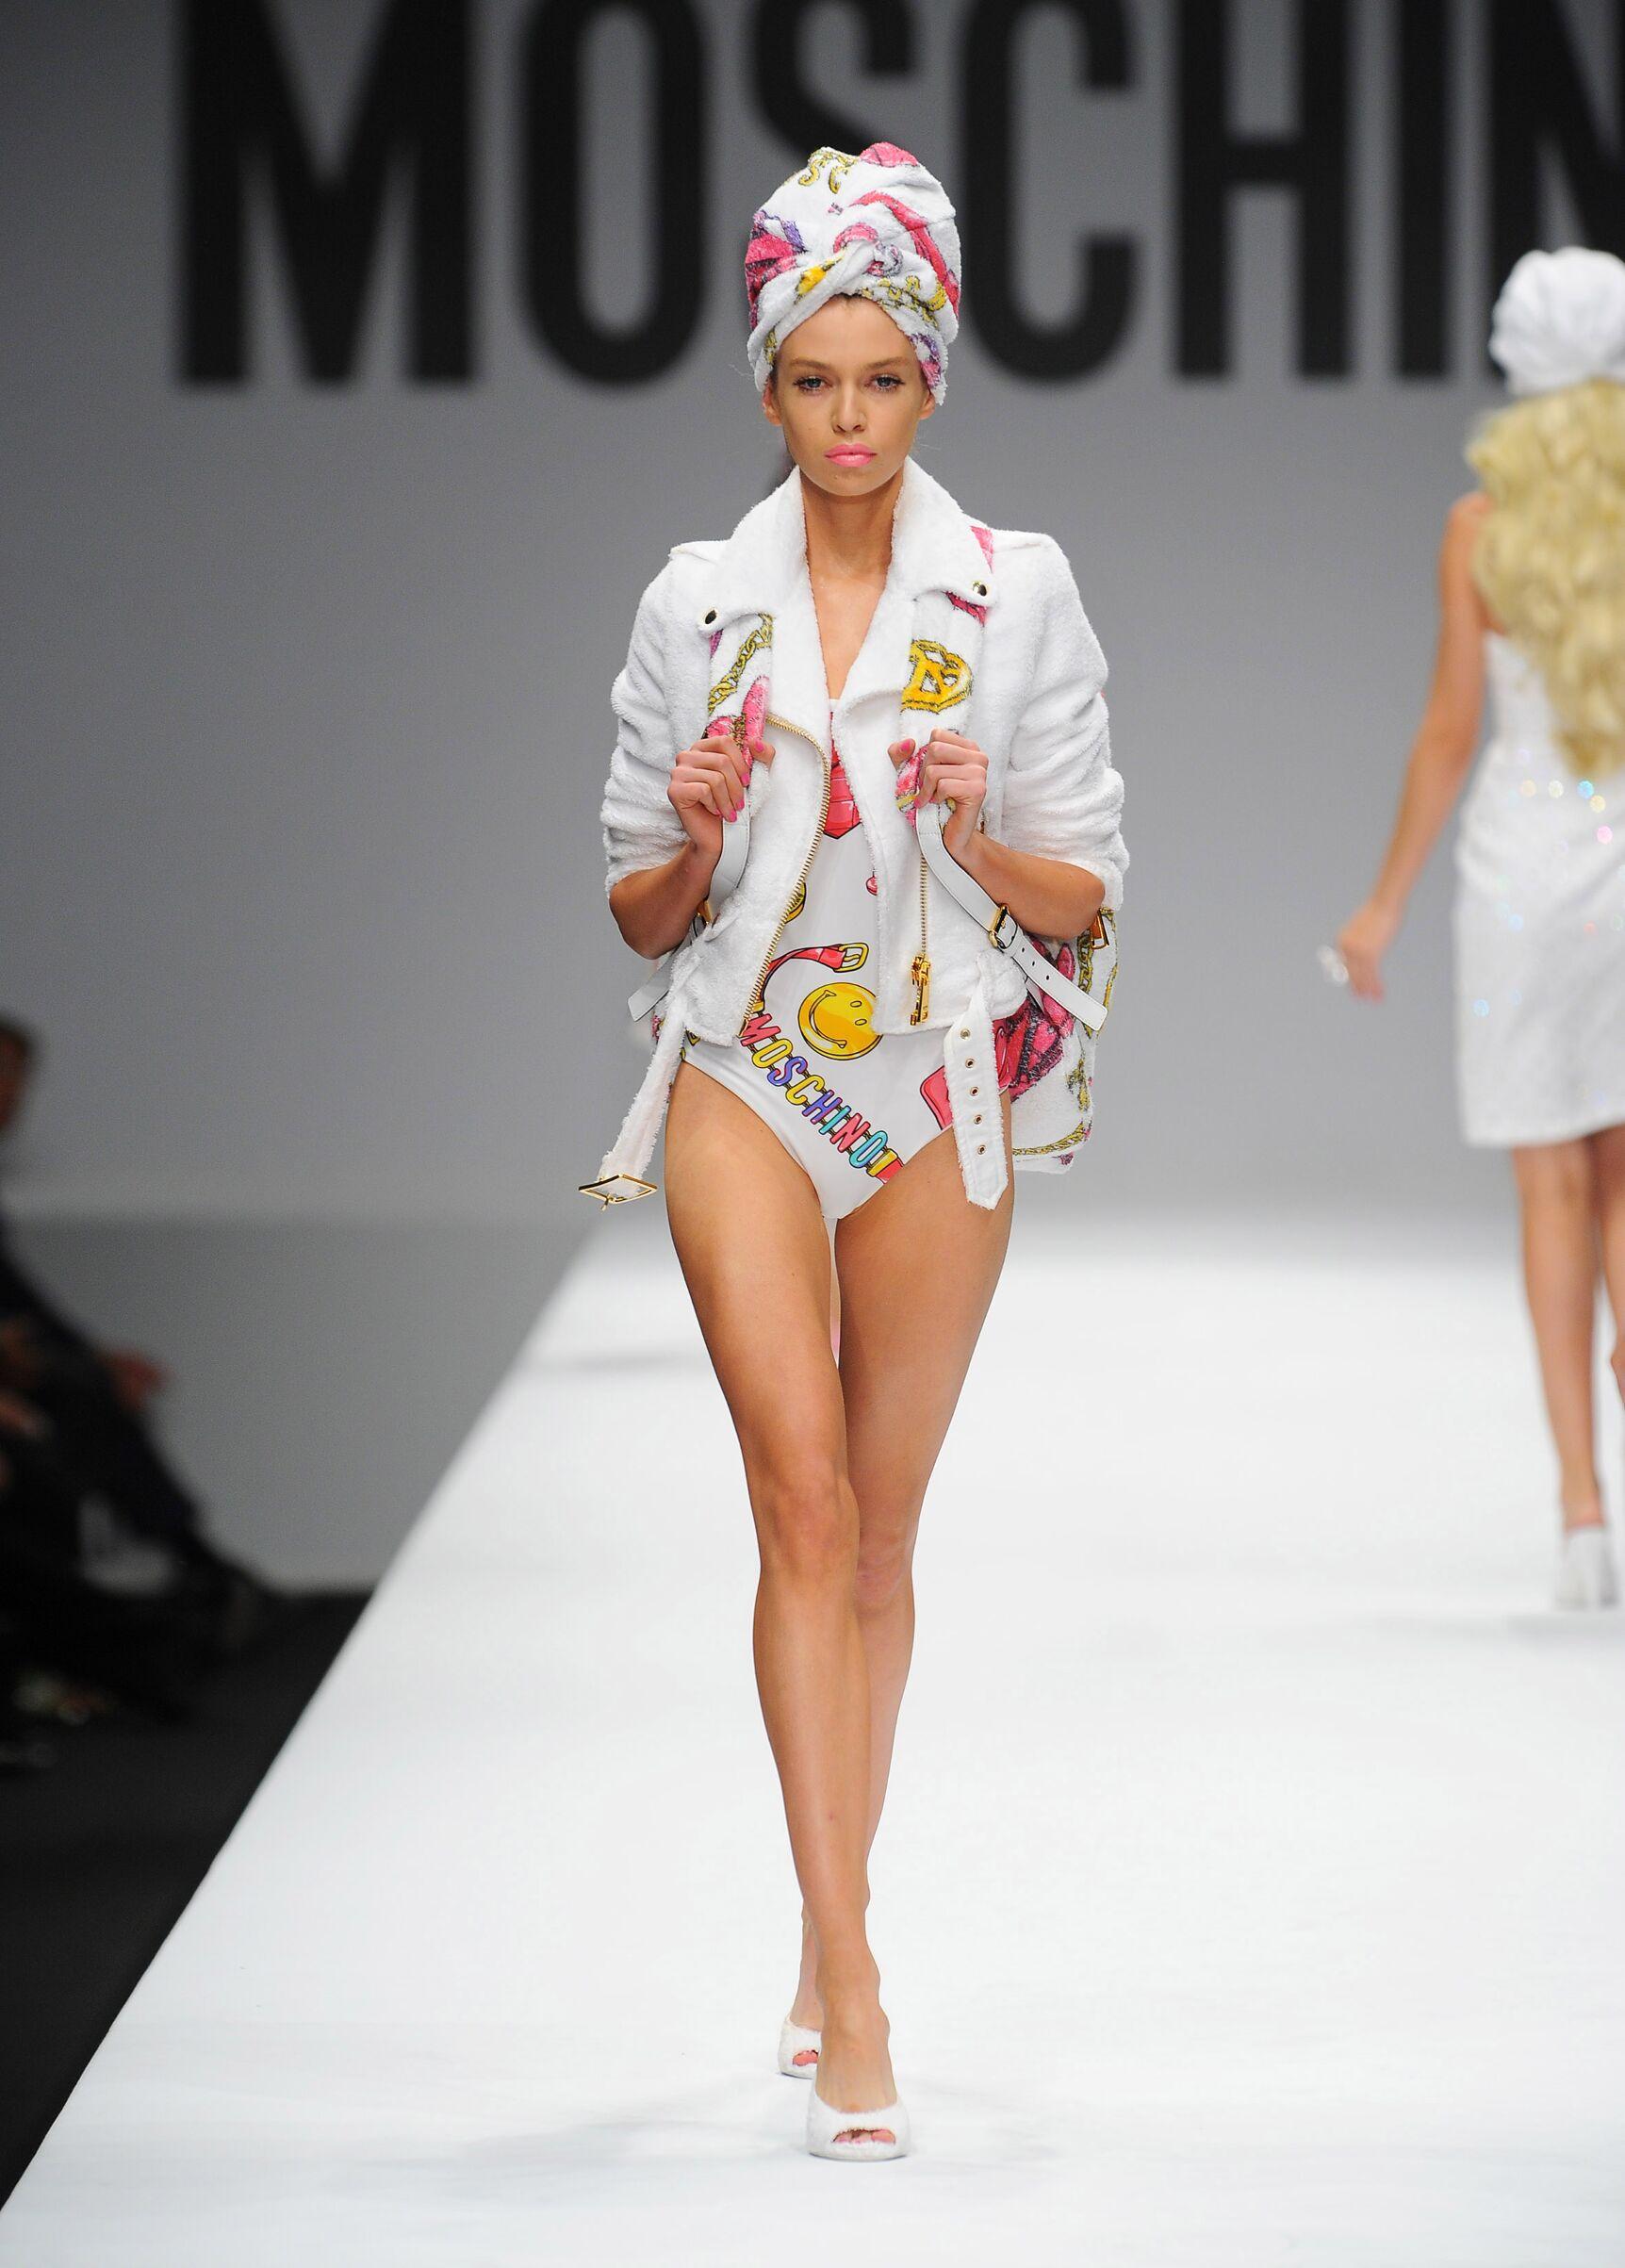 Moschino Spring 2015 Catwalk